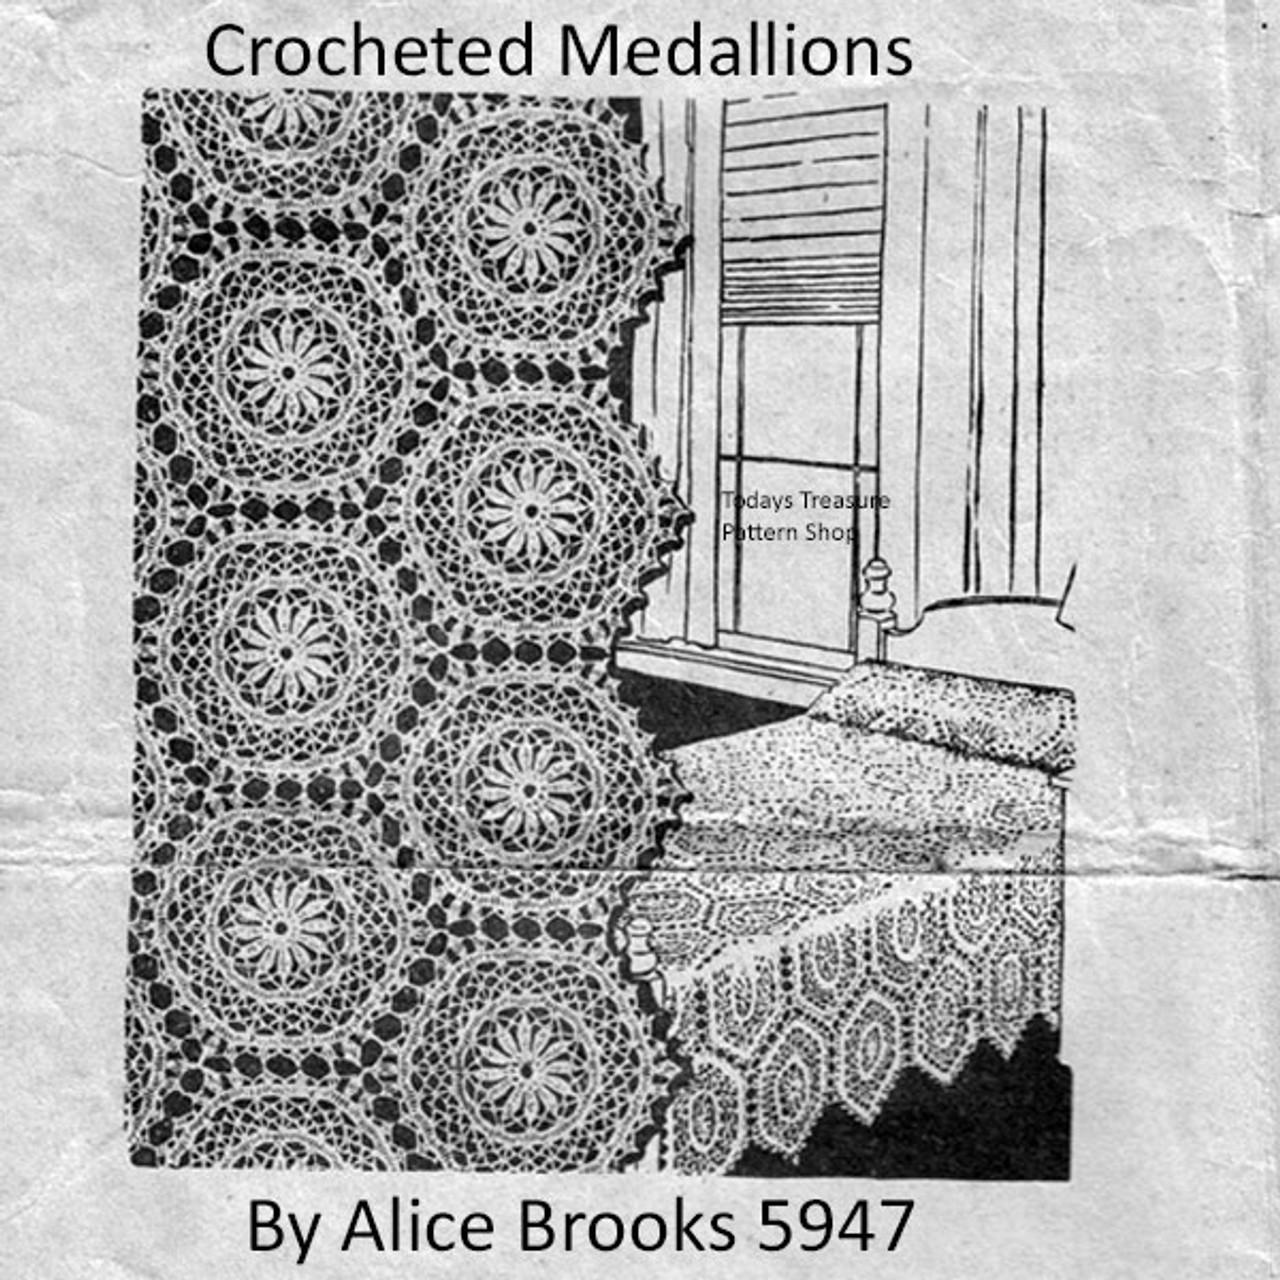 Alice Brooks 5947, Crochet Medallion Pattern